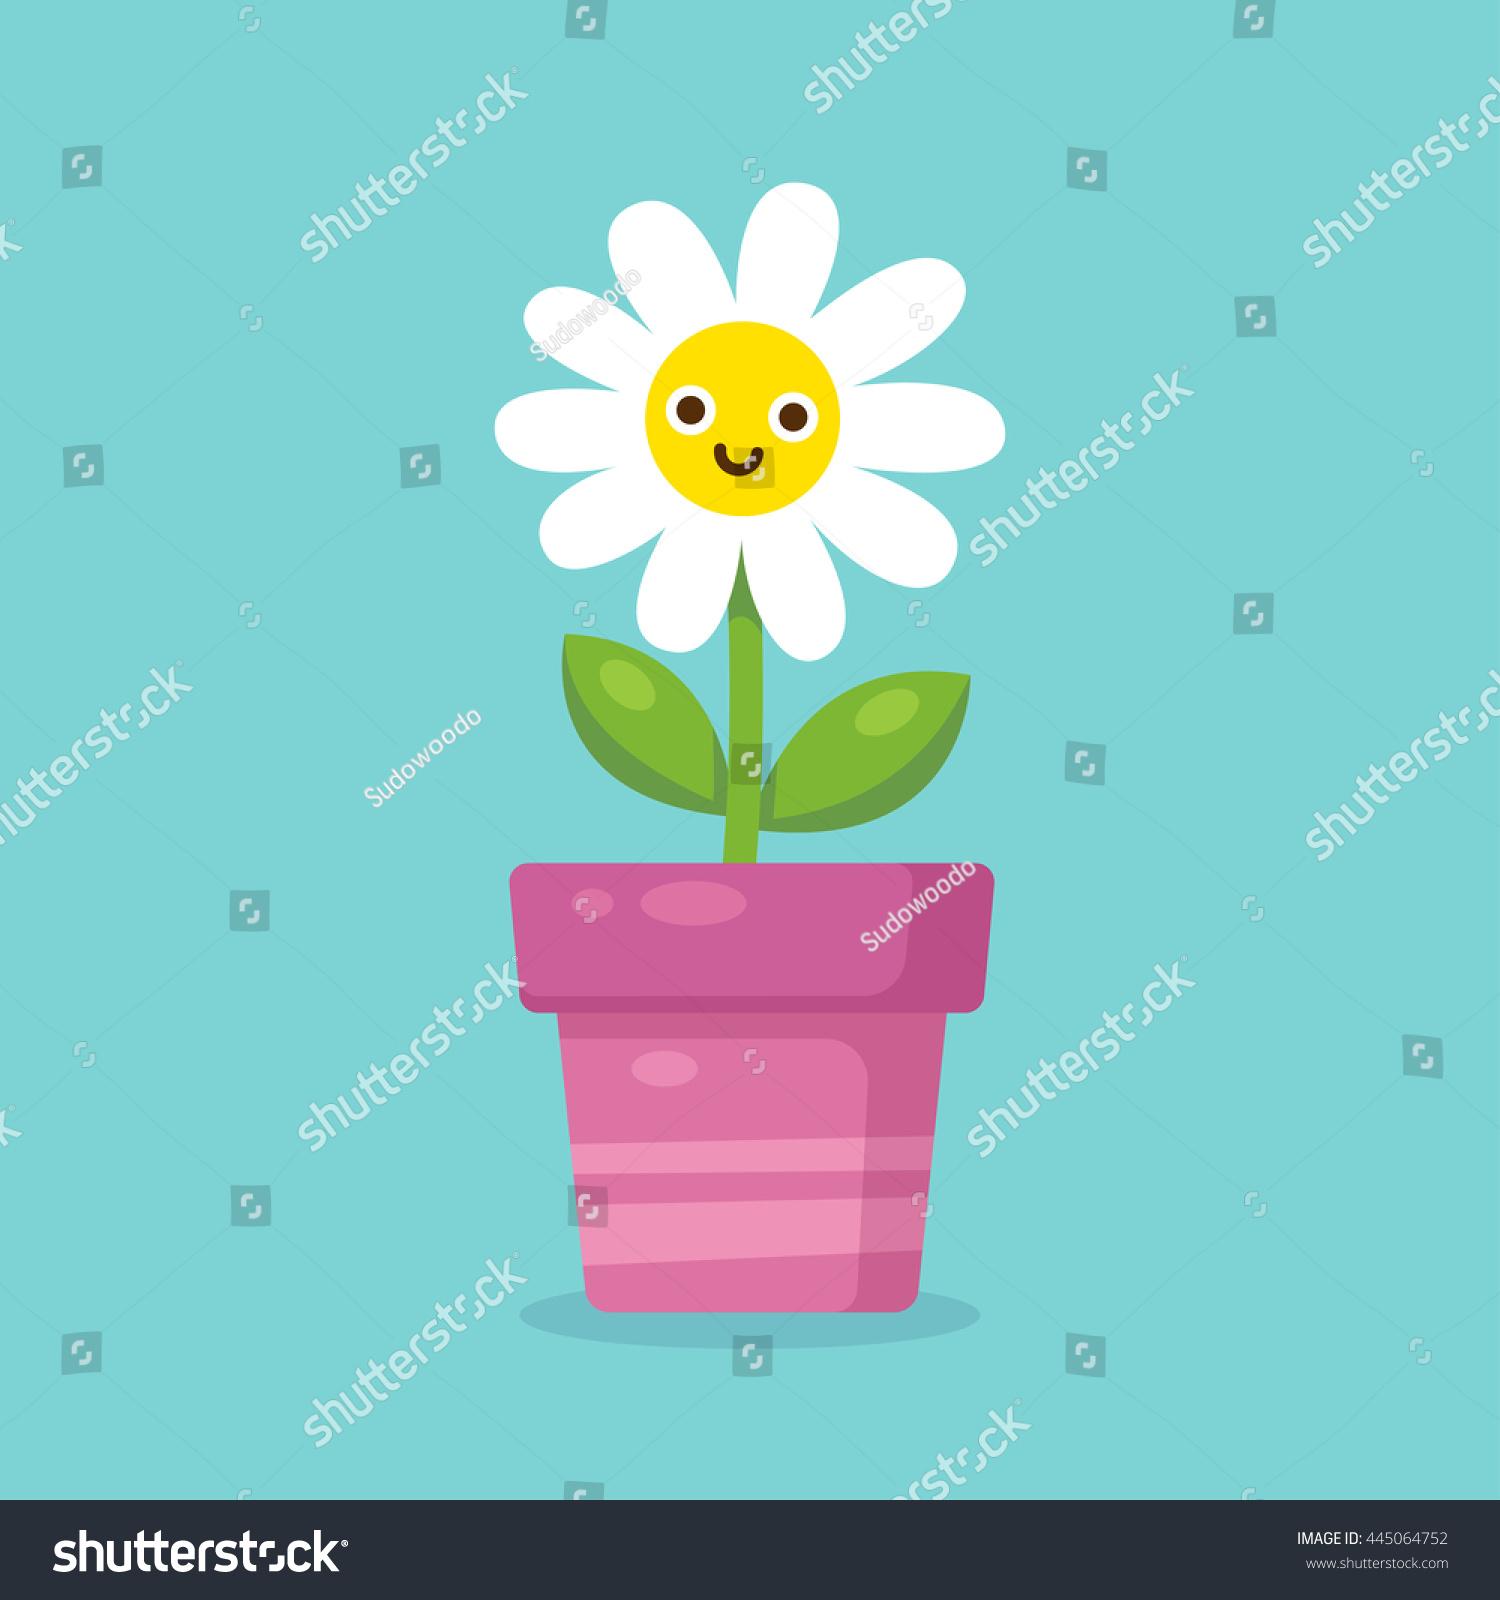 Cute cartoon happy flower pot adorable stock vector 445064752 cute cartoon happy flower in pot adorable smiling daisy flower in simple modern flat style izmirmasajfo